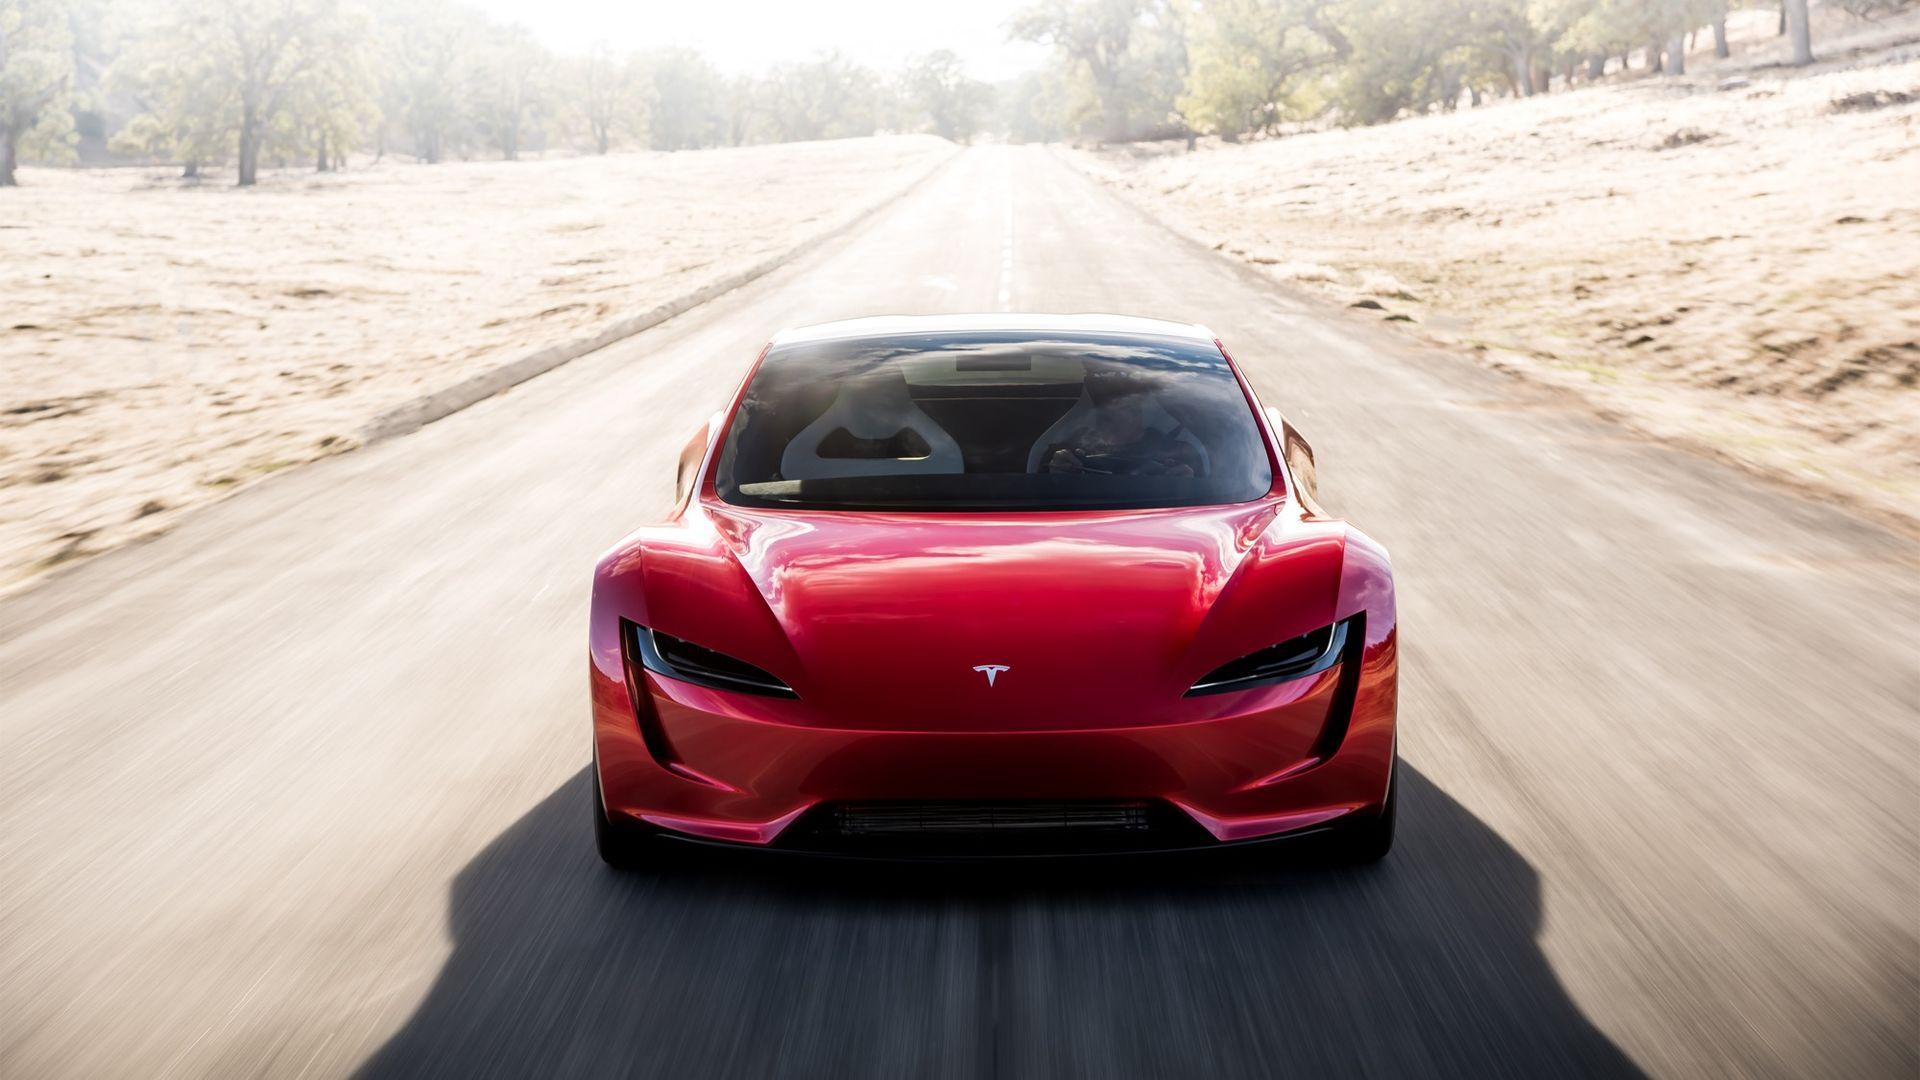 Nu kan du köpa dig en Tesla med bitcoins